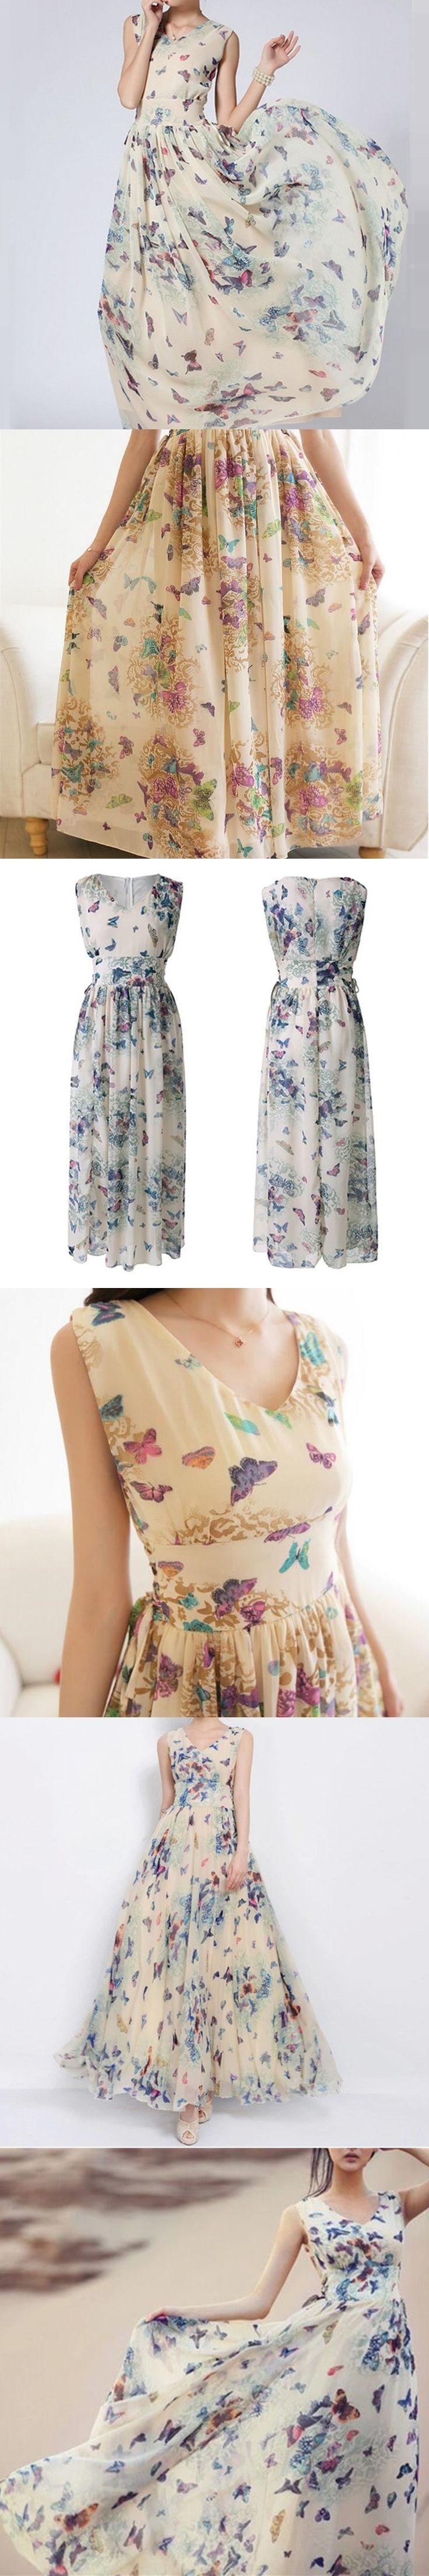 Fashion Butterfly Floral Print Dress,2017 Summer Beach Chiffon Sleeveless Maxi Dress Plus Size,Elegant Party Long Dress Vestidos